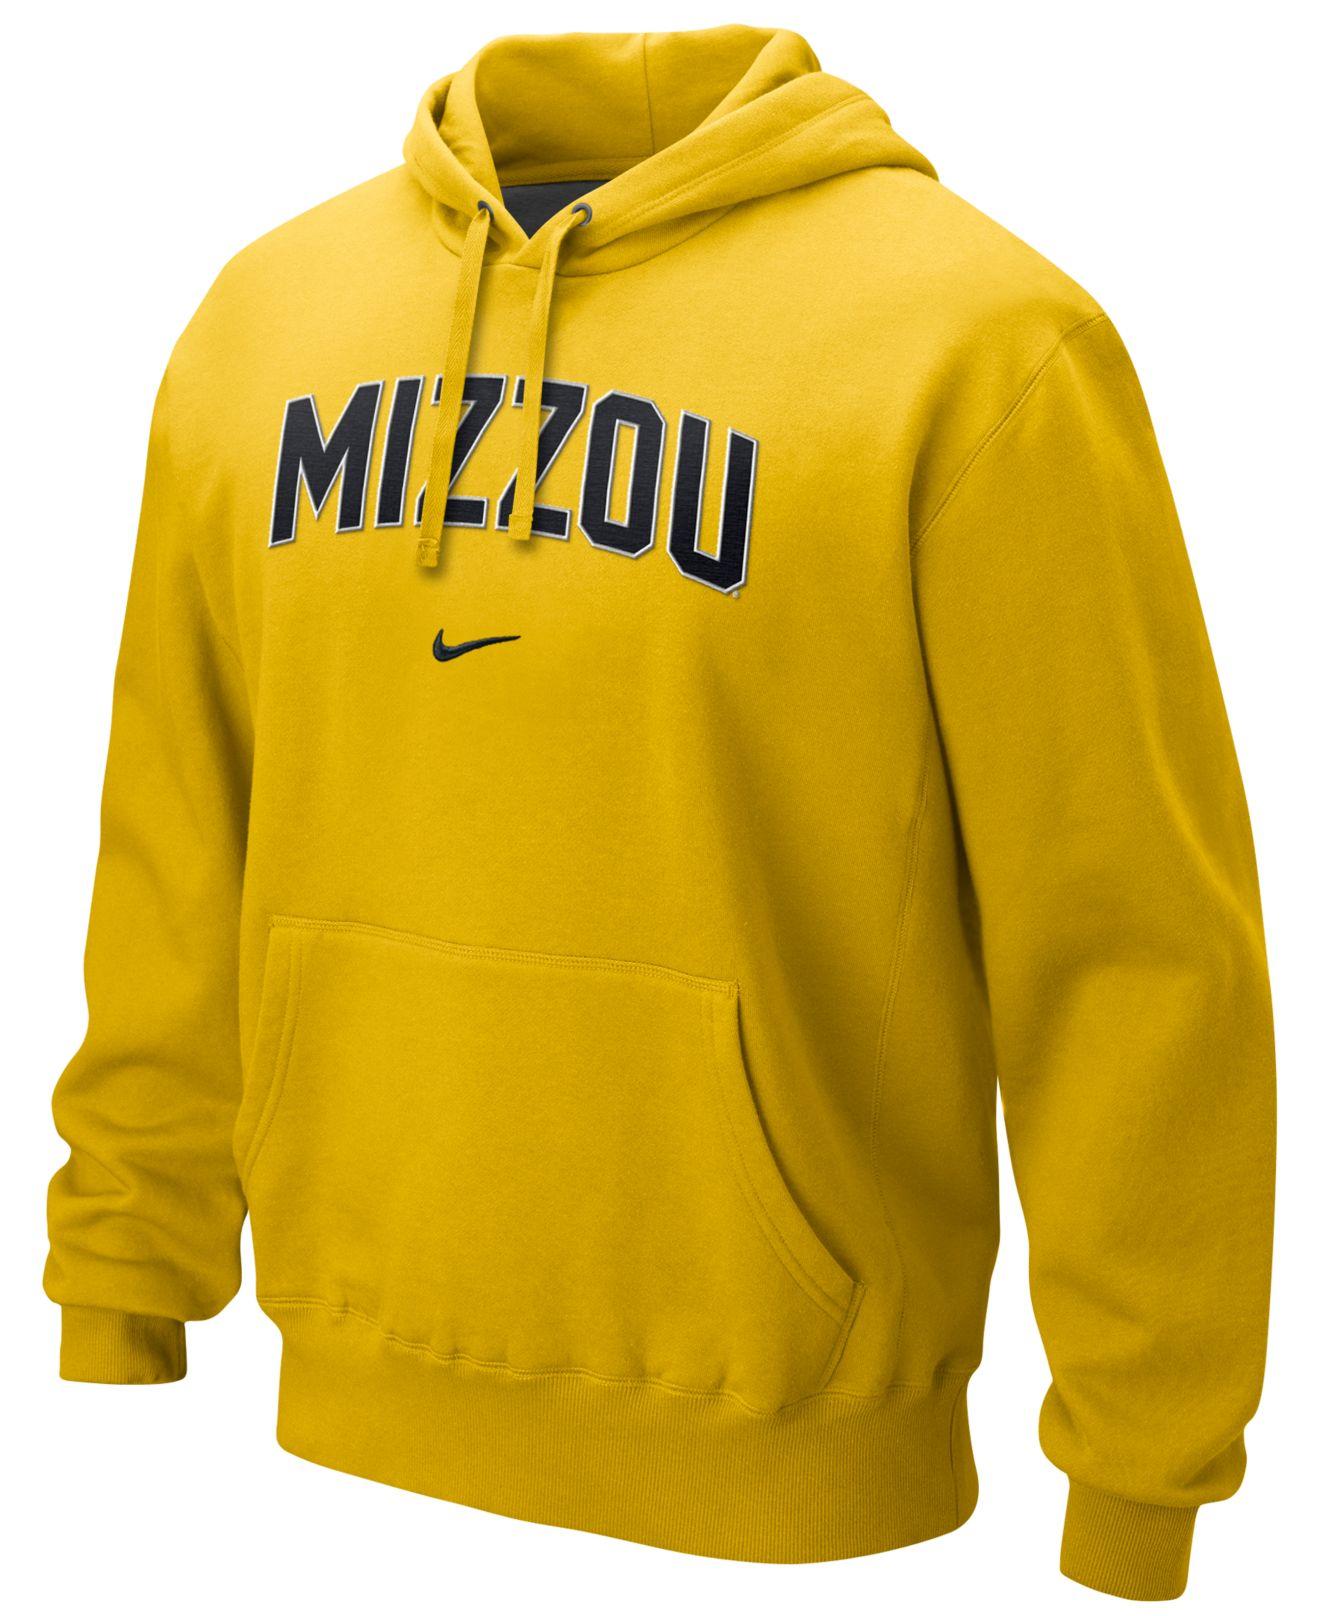 Missouri tigers hoodie